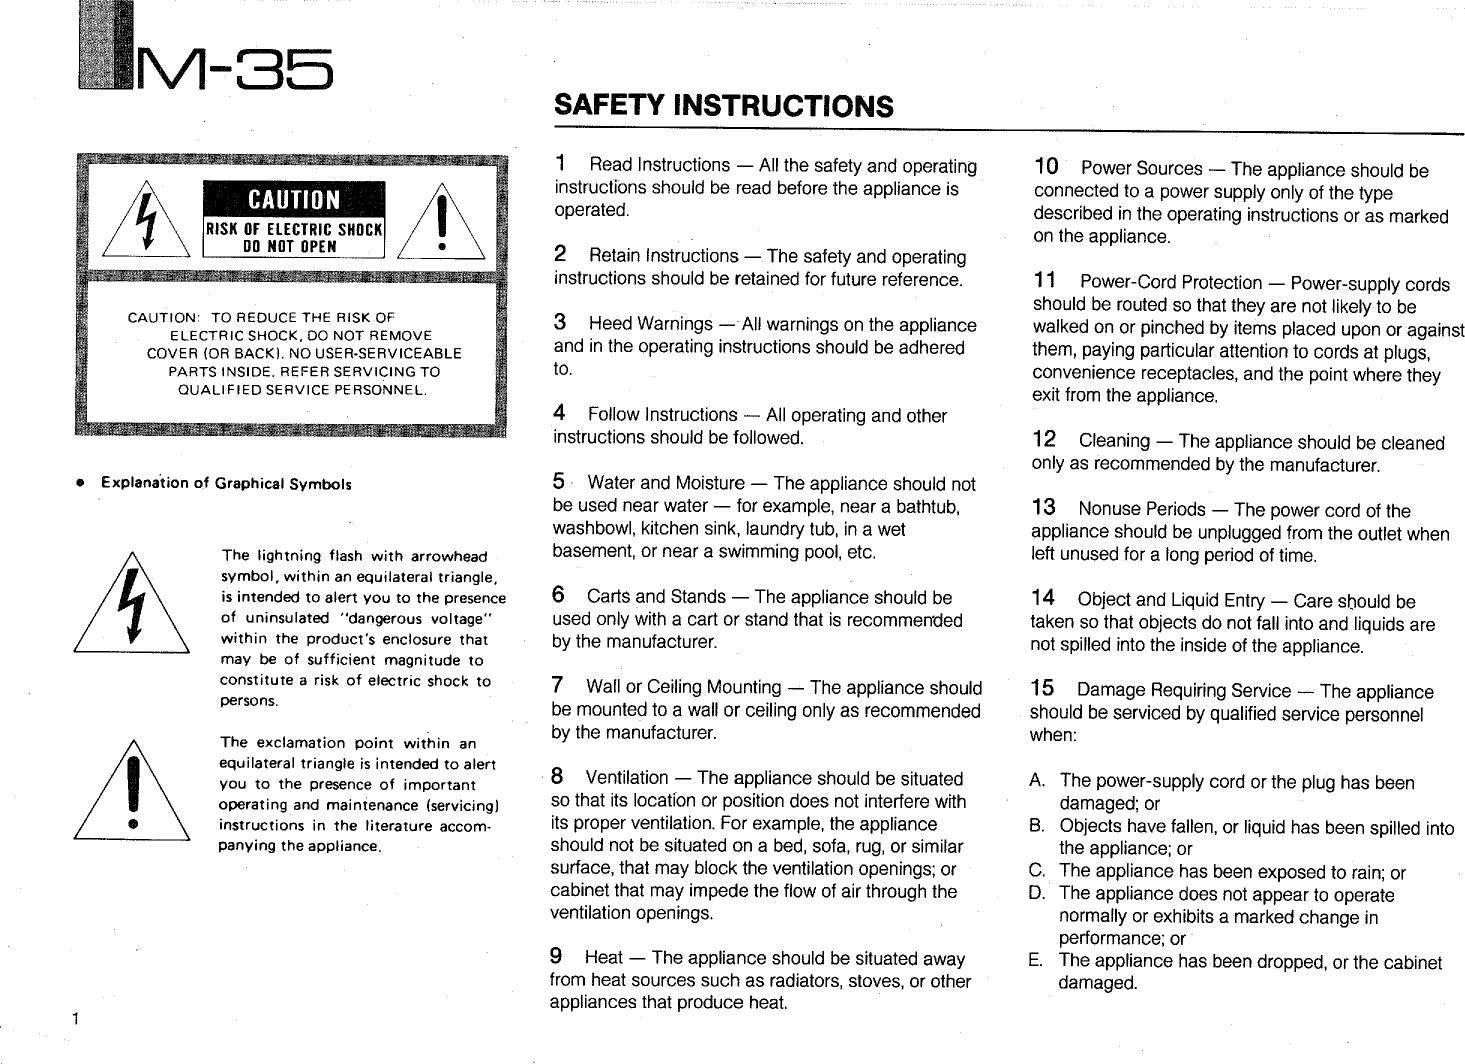 yamaha m35 user guide free owners manual u2022 rh wordworksbysea com Yamaha Electronics Manuals Yamaha HTR-5730 Owner's Manual